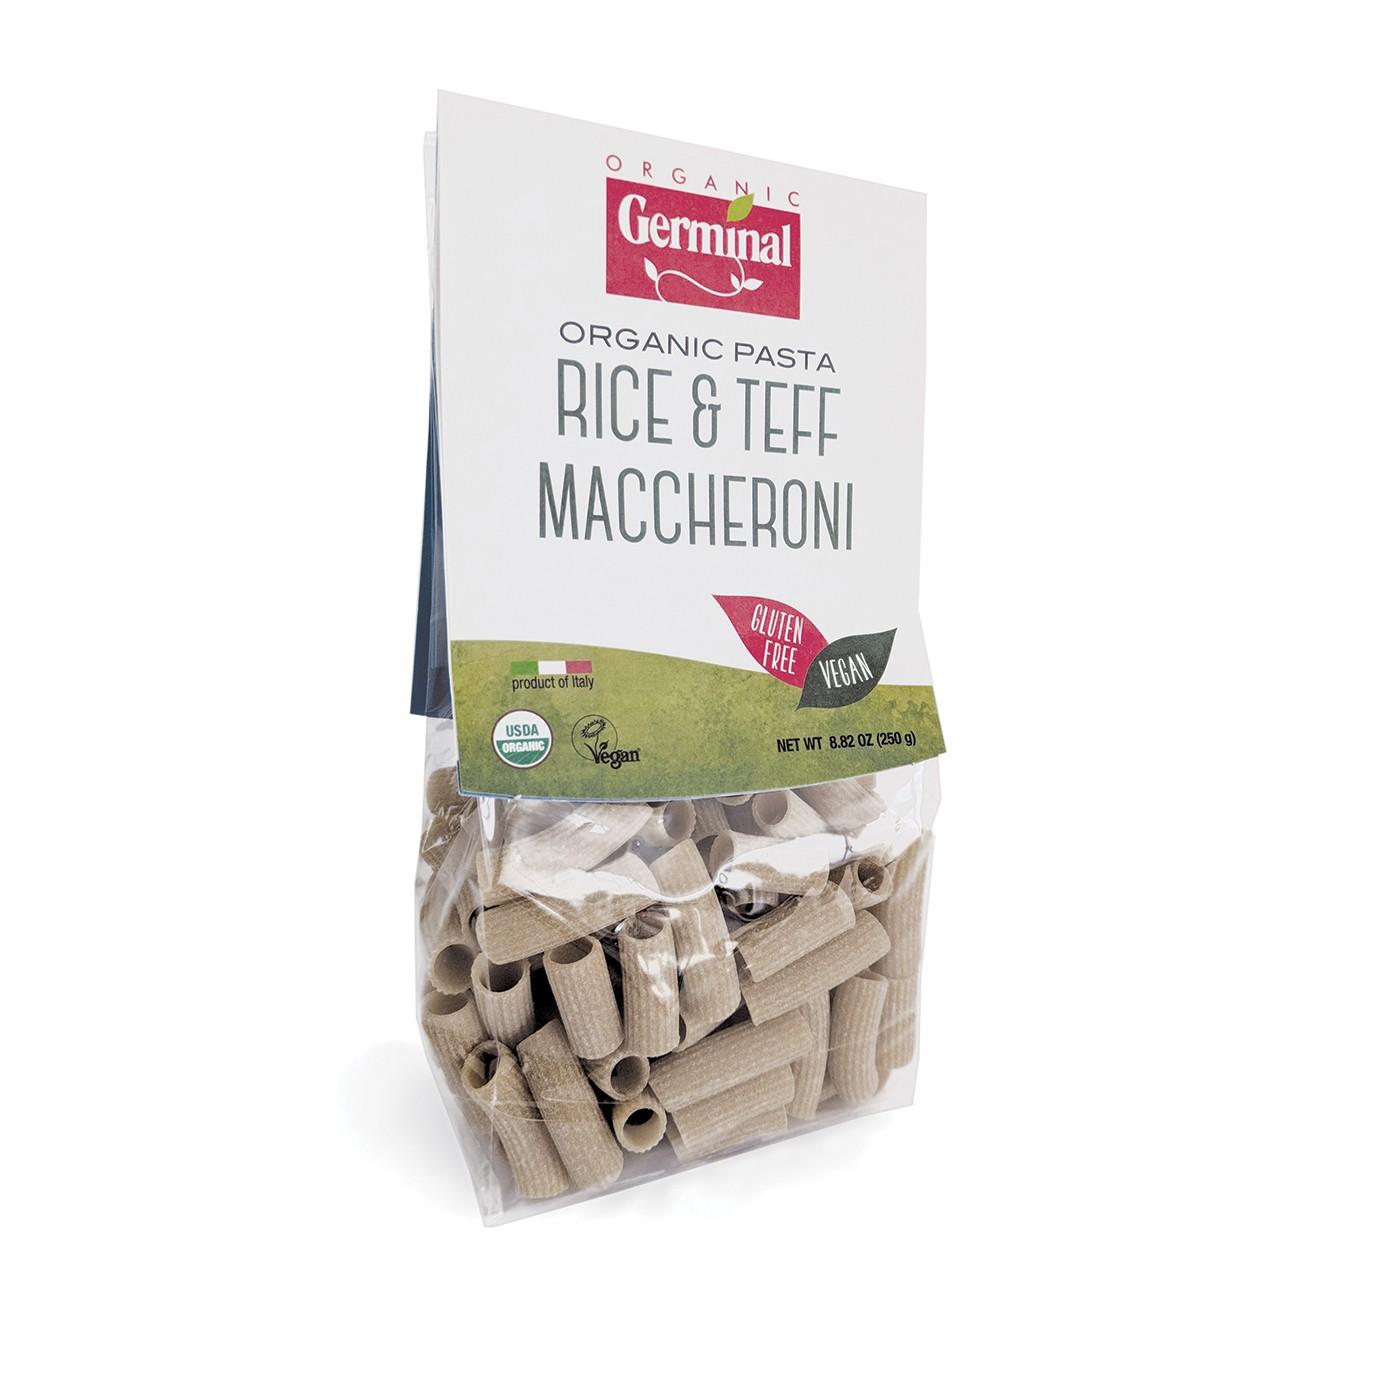 Rice & Teff Maccheroni 8 oz